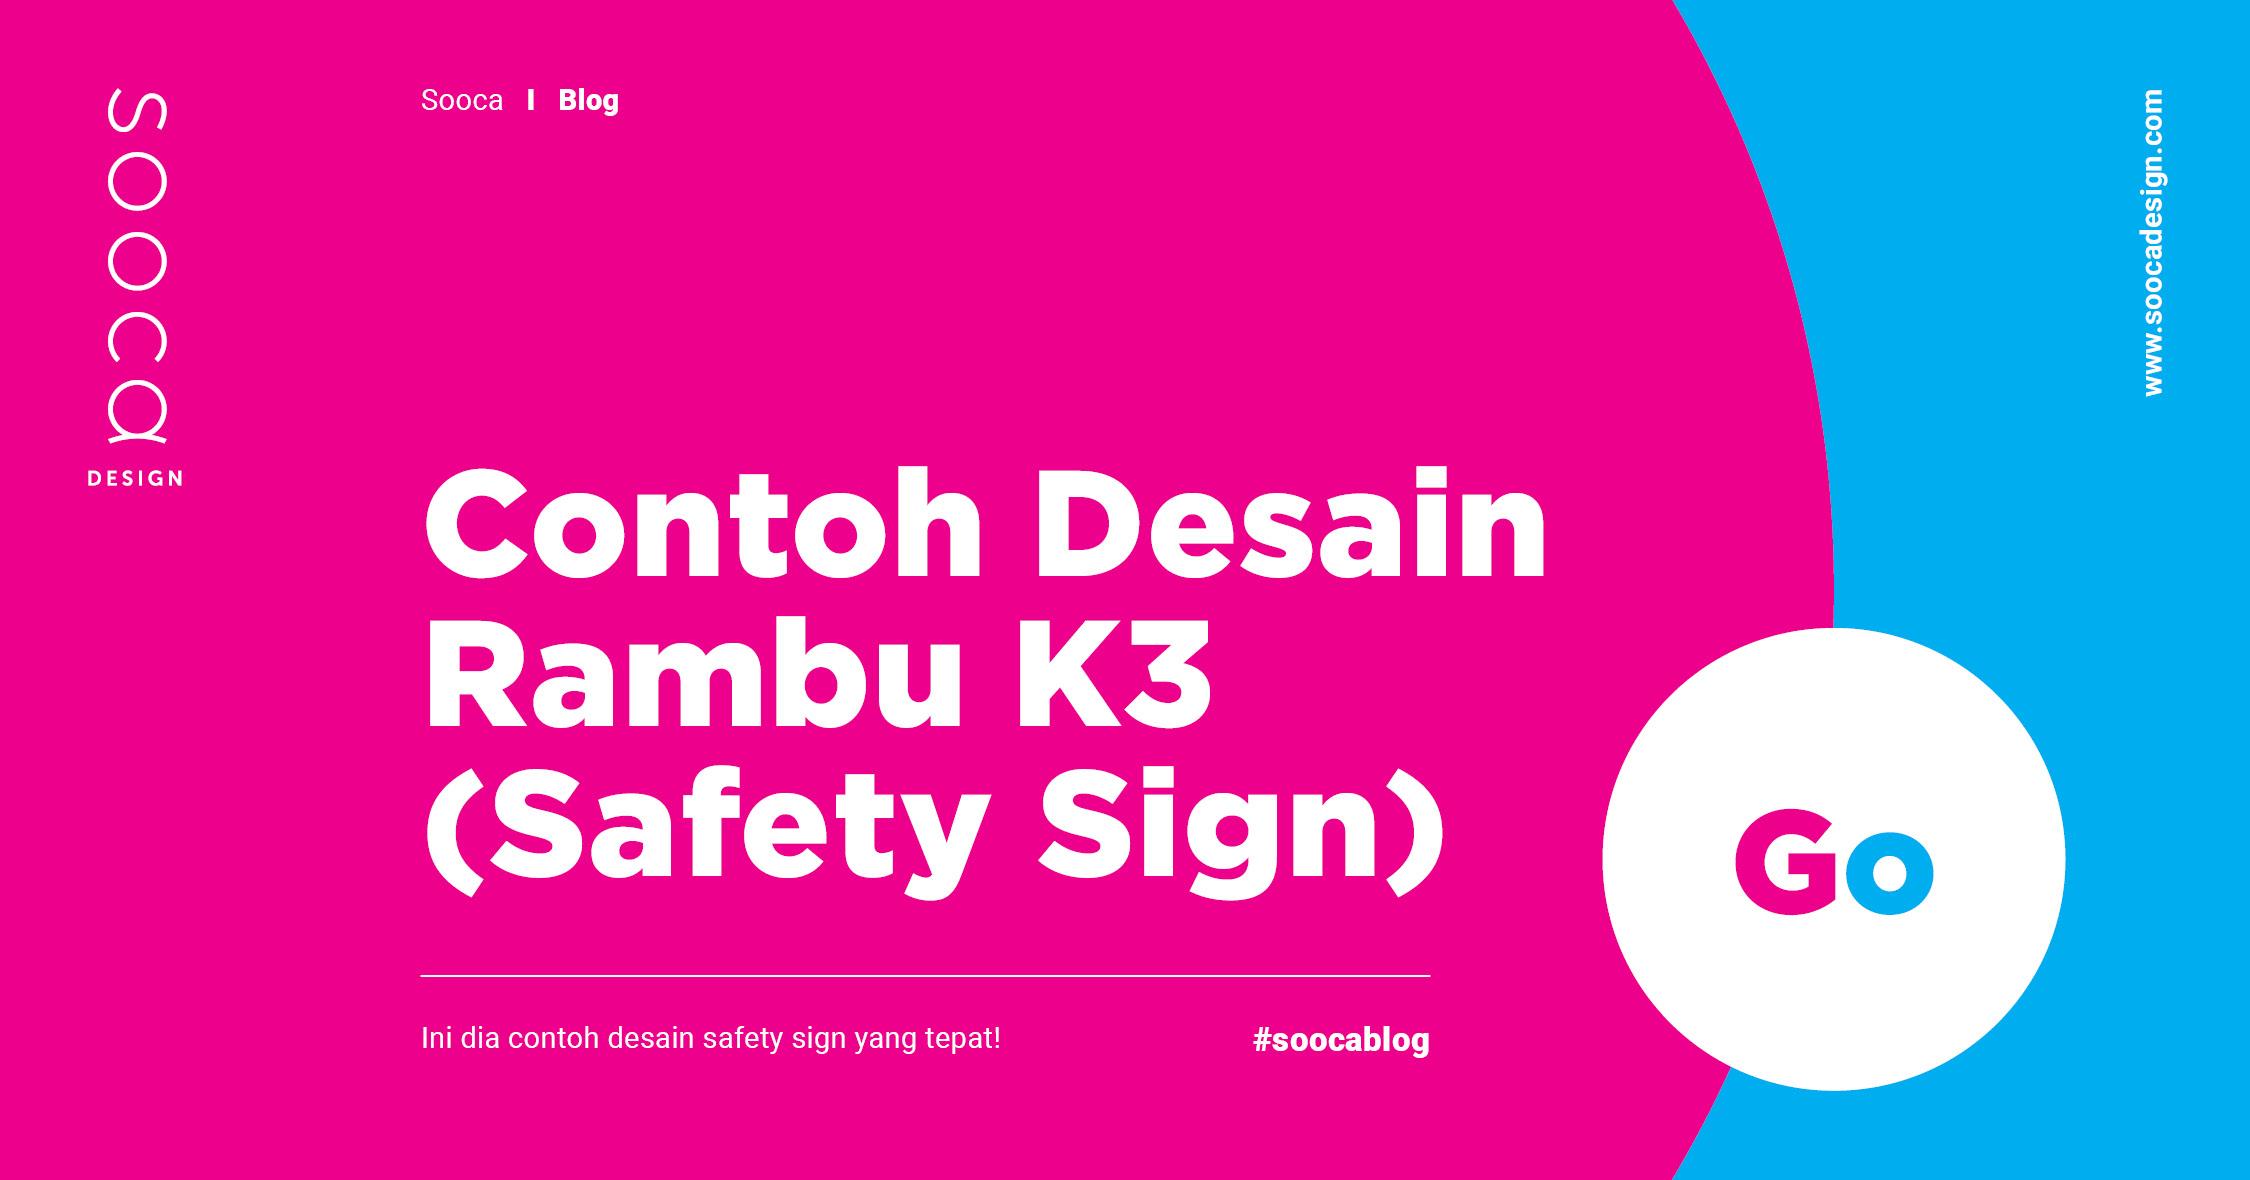 Masih Awam Dengan Safety Sign Berikut Contoh Desain Rambu K3